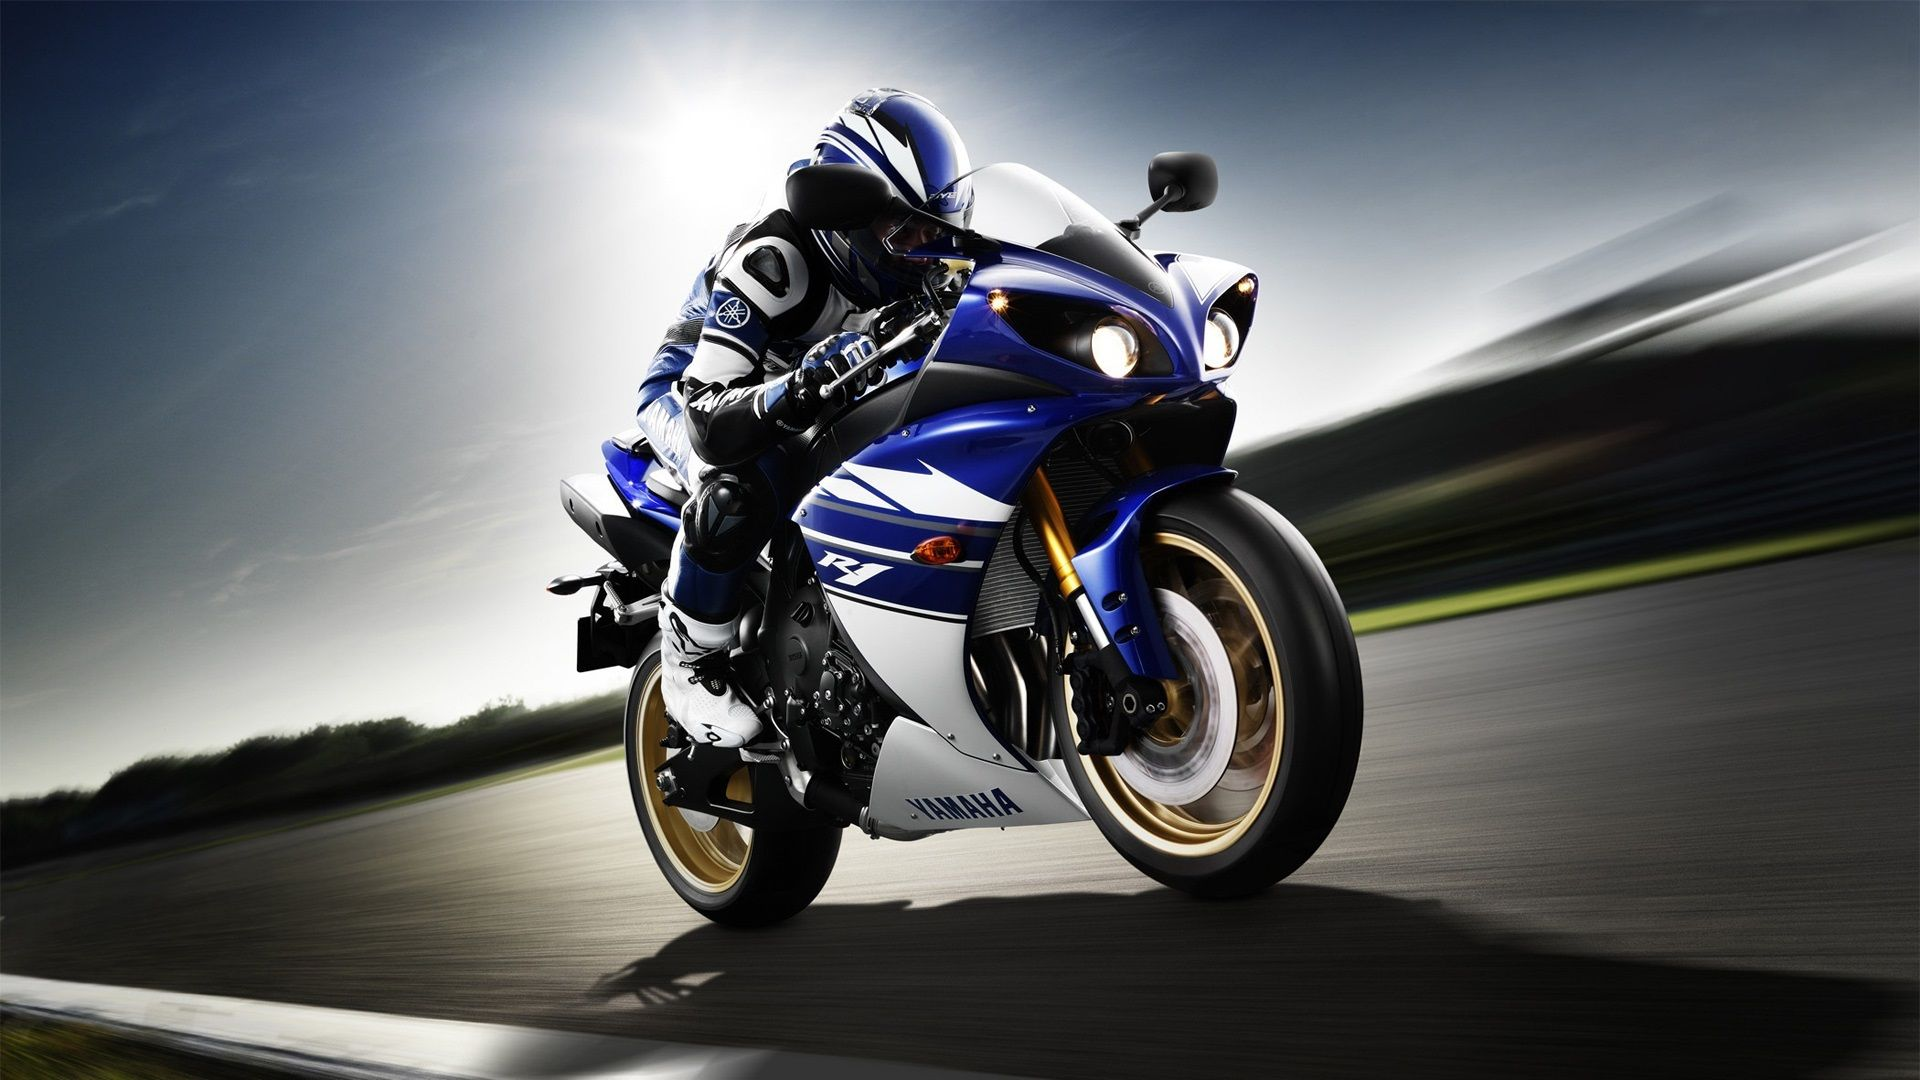 Yamaha Yzf R1 Motorcycle Rider Sport Bike Speed Wallpaper